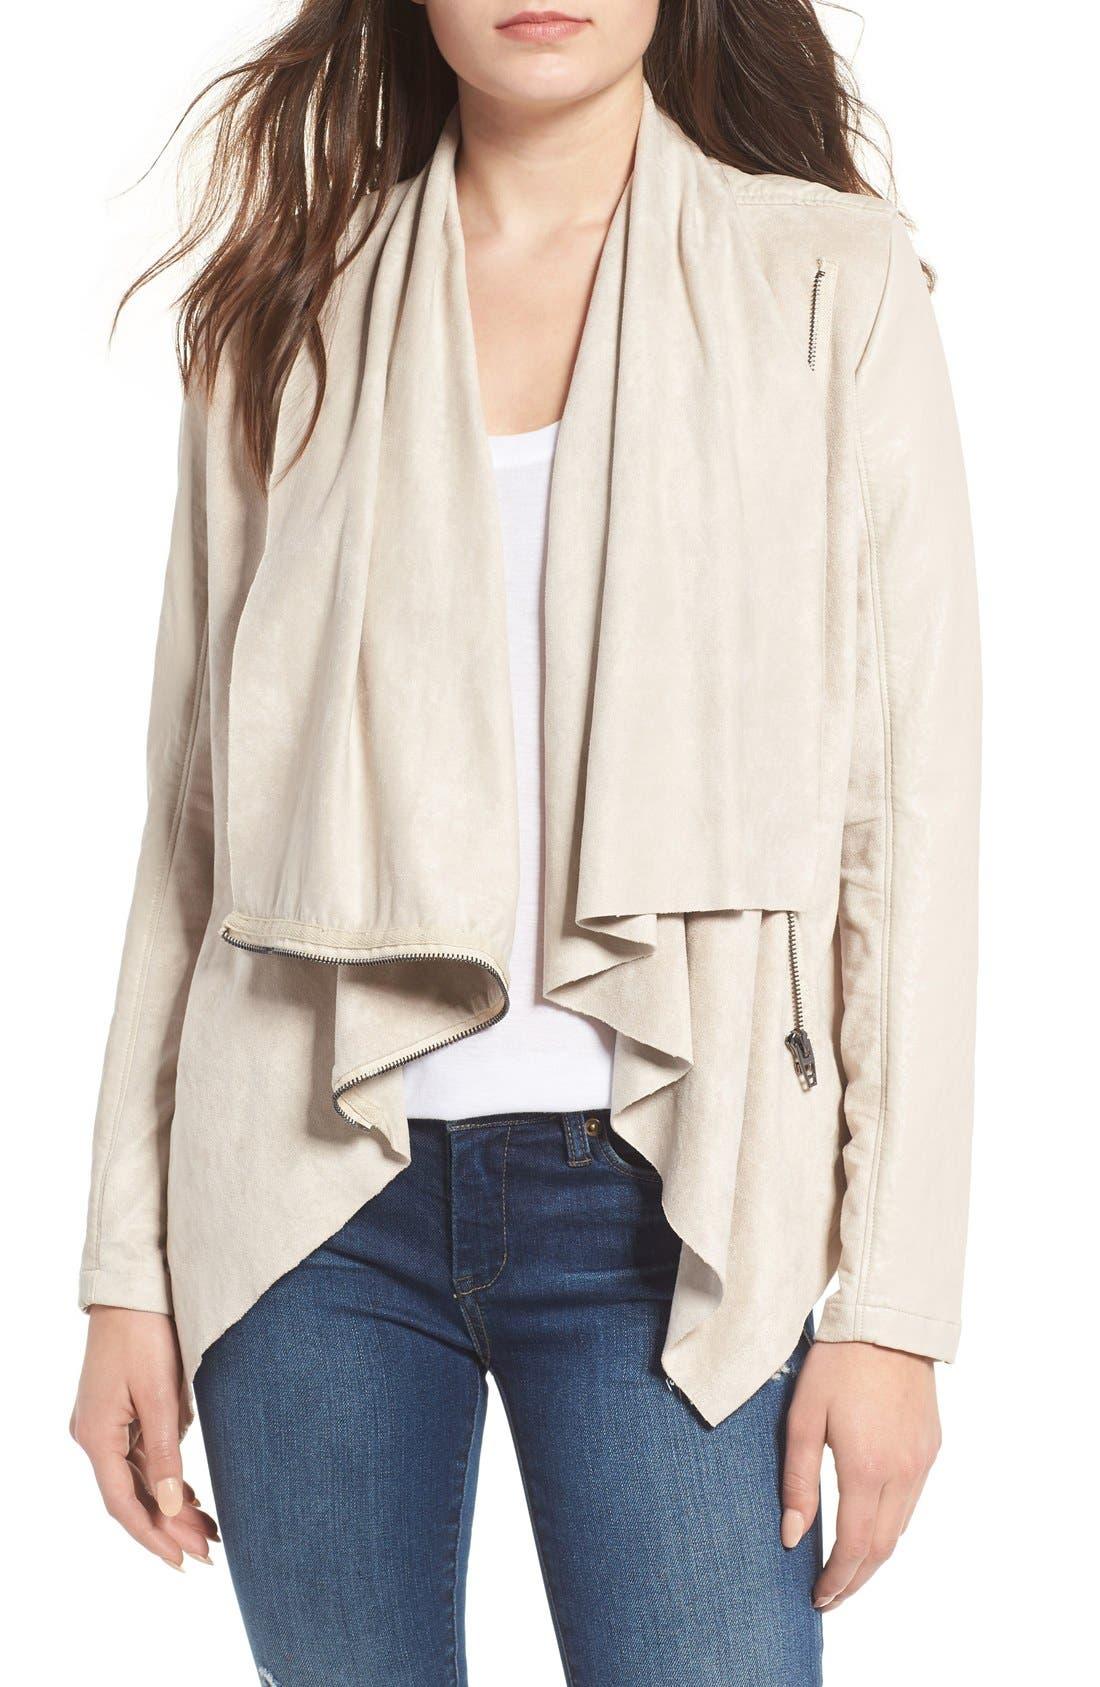 Main Image - BLANKNYC Mixed Media Faux Leather Drape Front Jacket